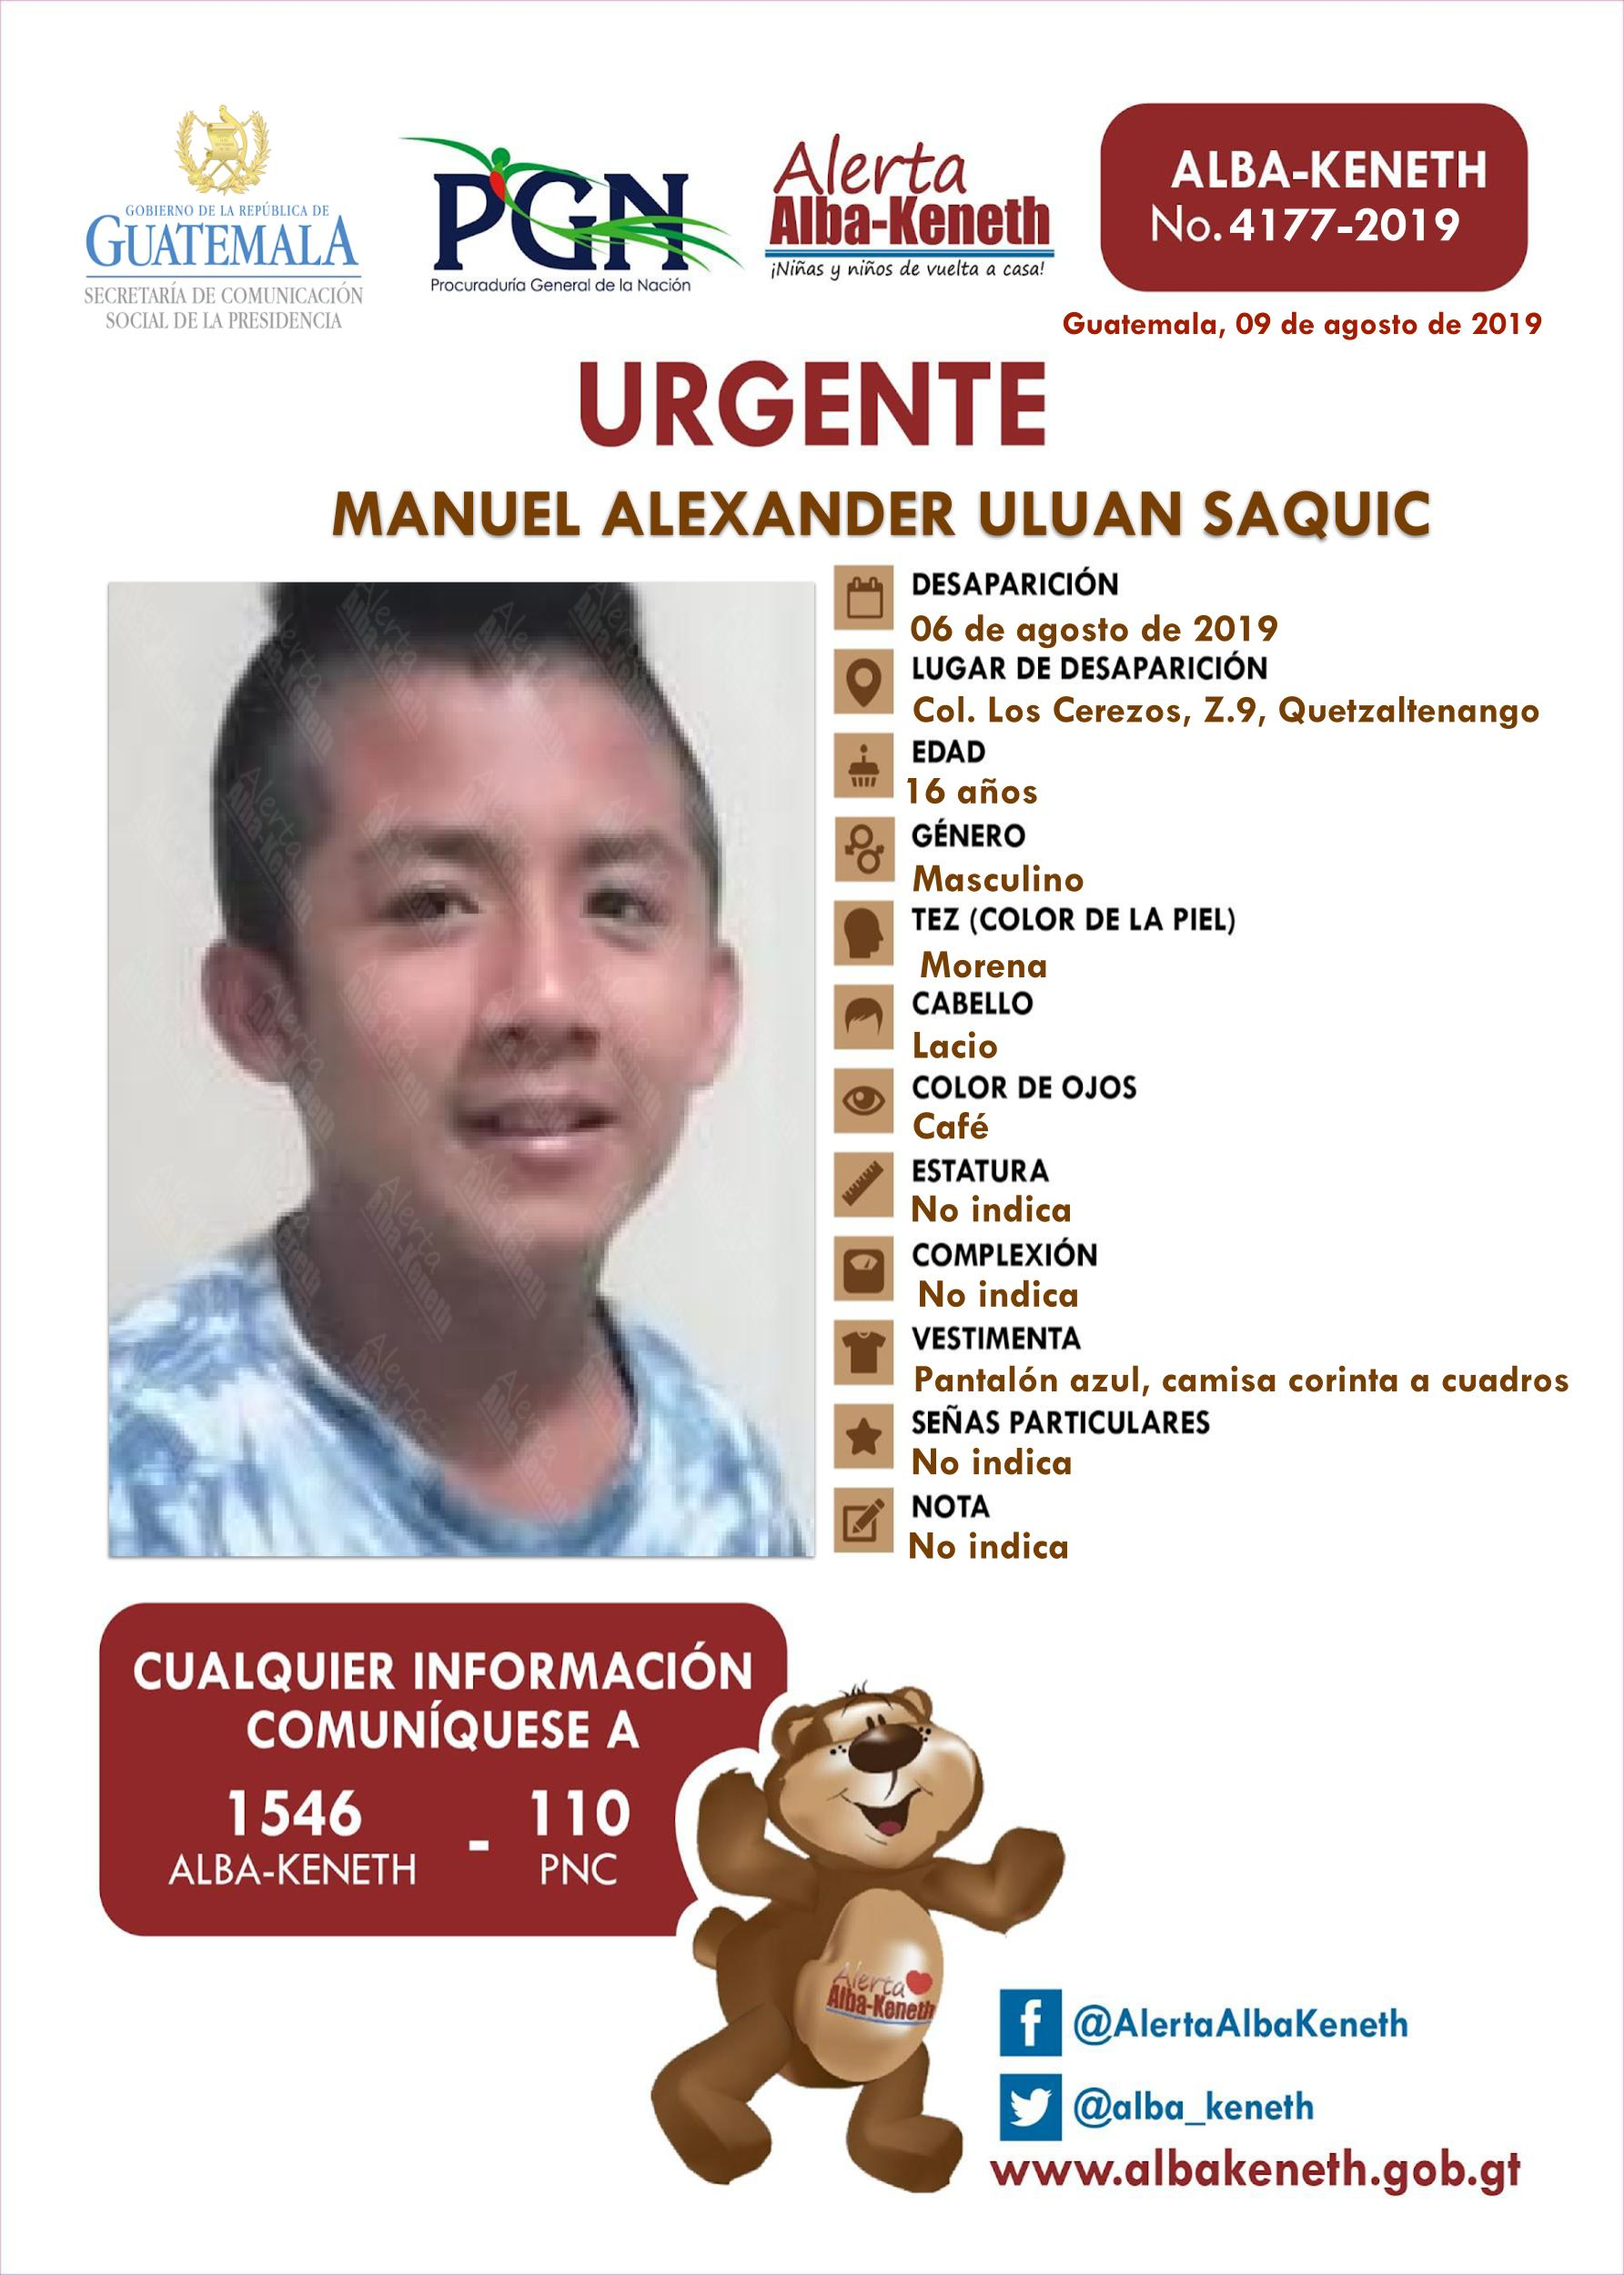 Manuel Alexander Uluan Saquic